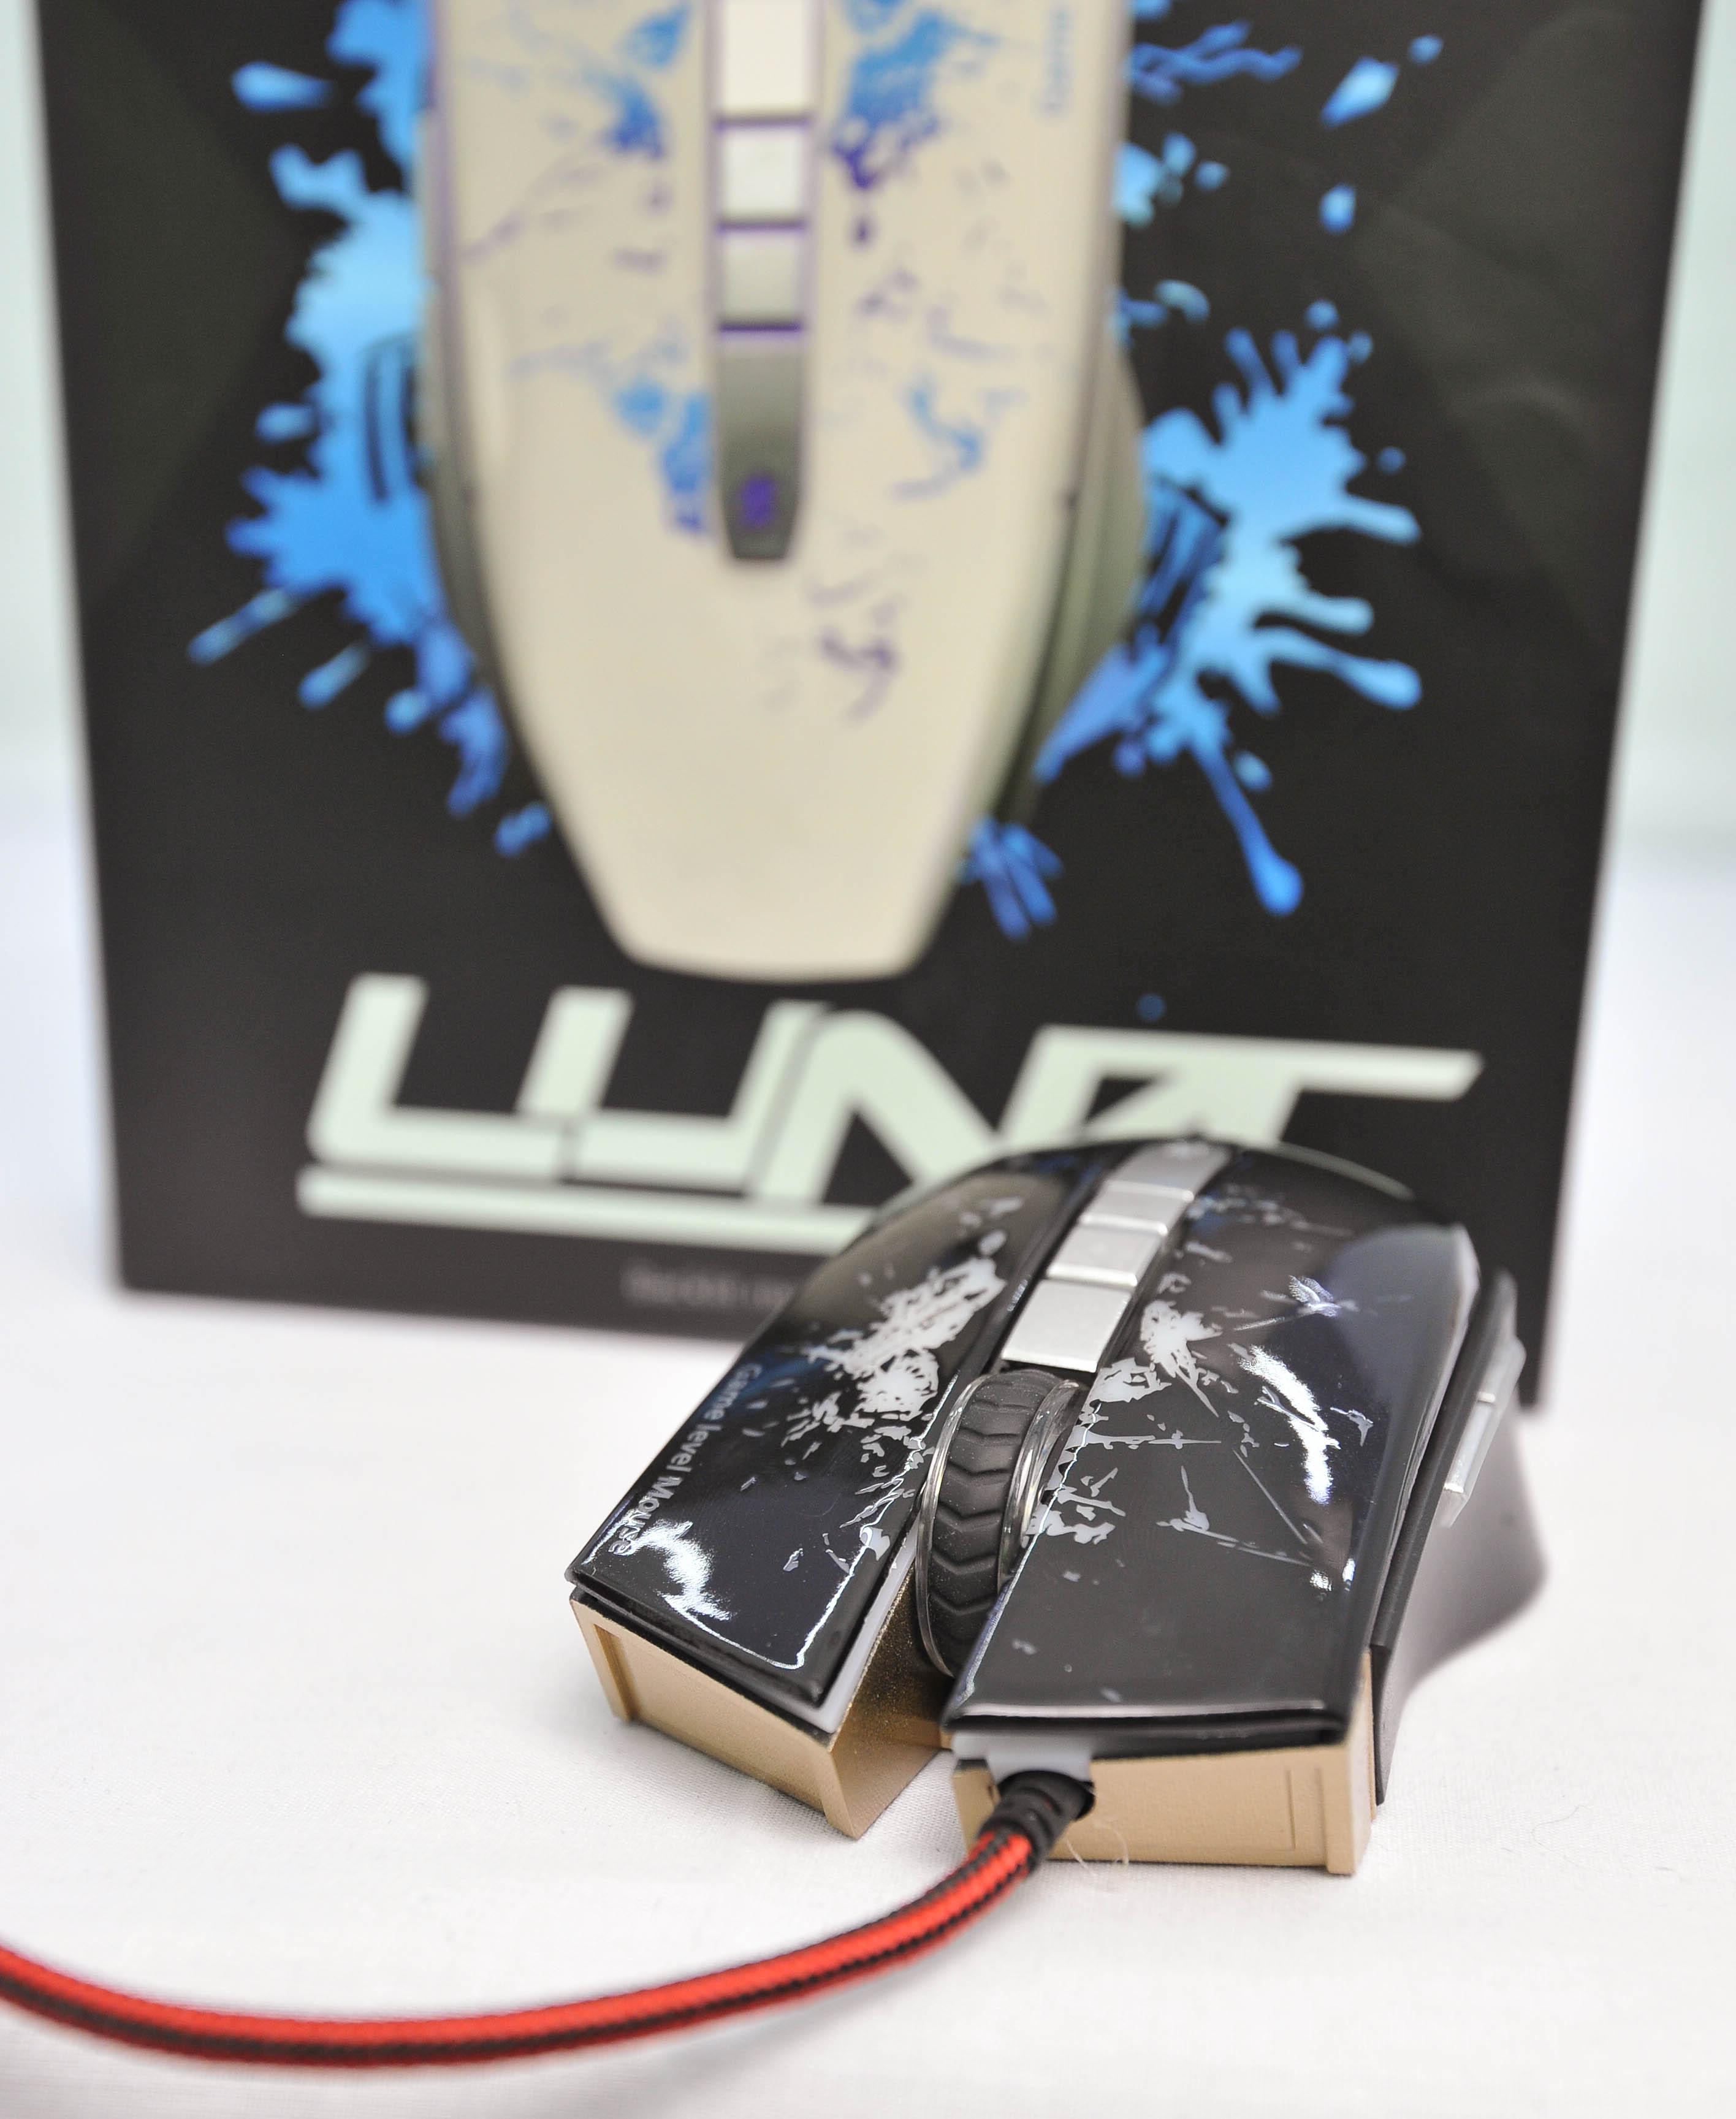 Infinity Luna Black - 2400 DPI Gaming Mouse